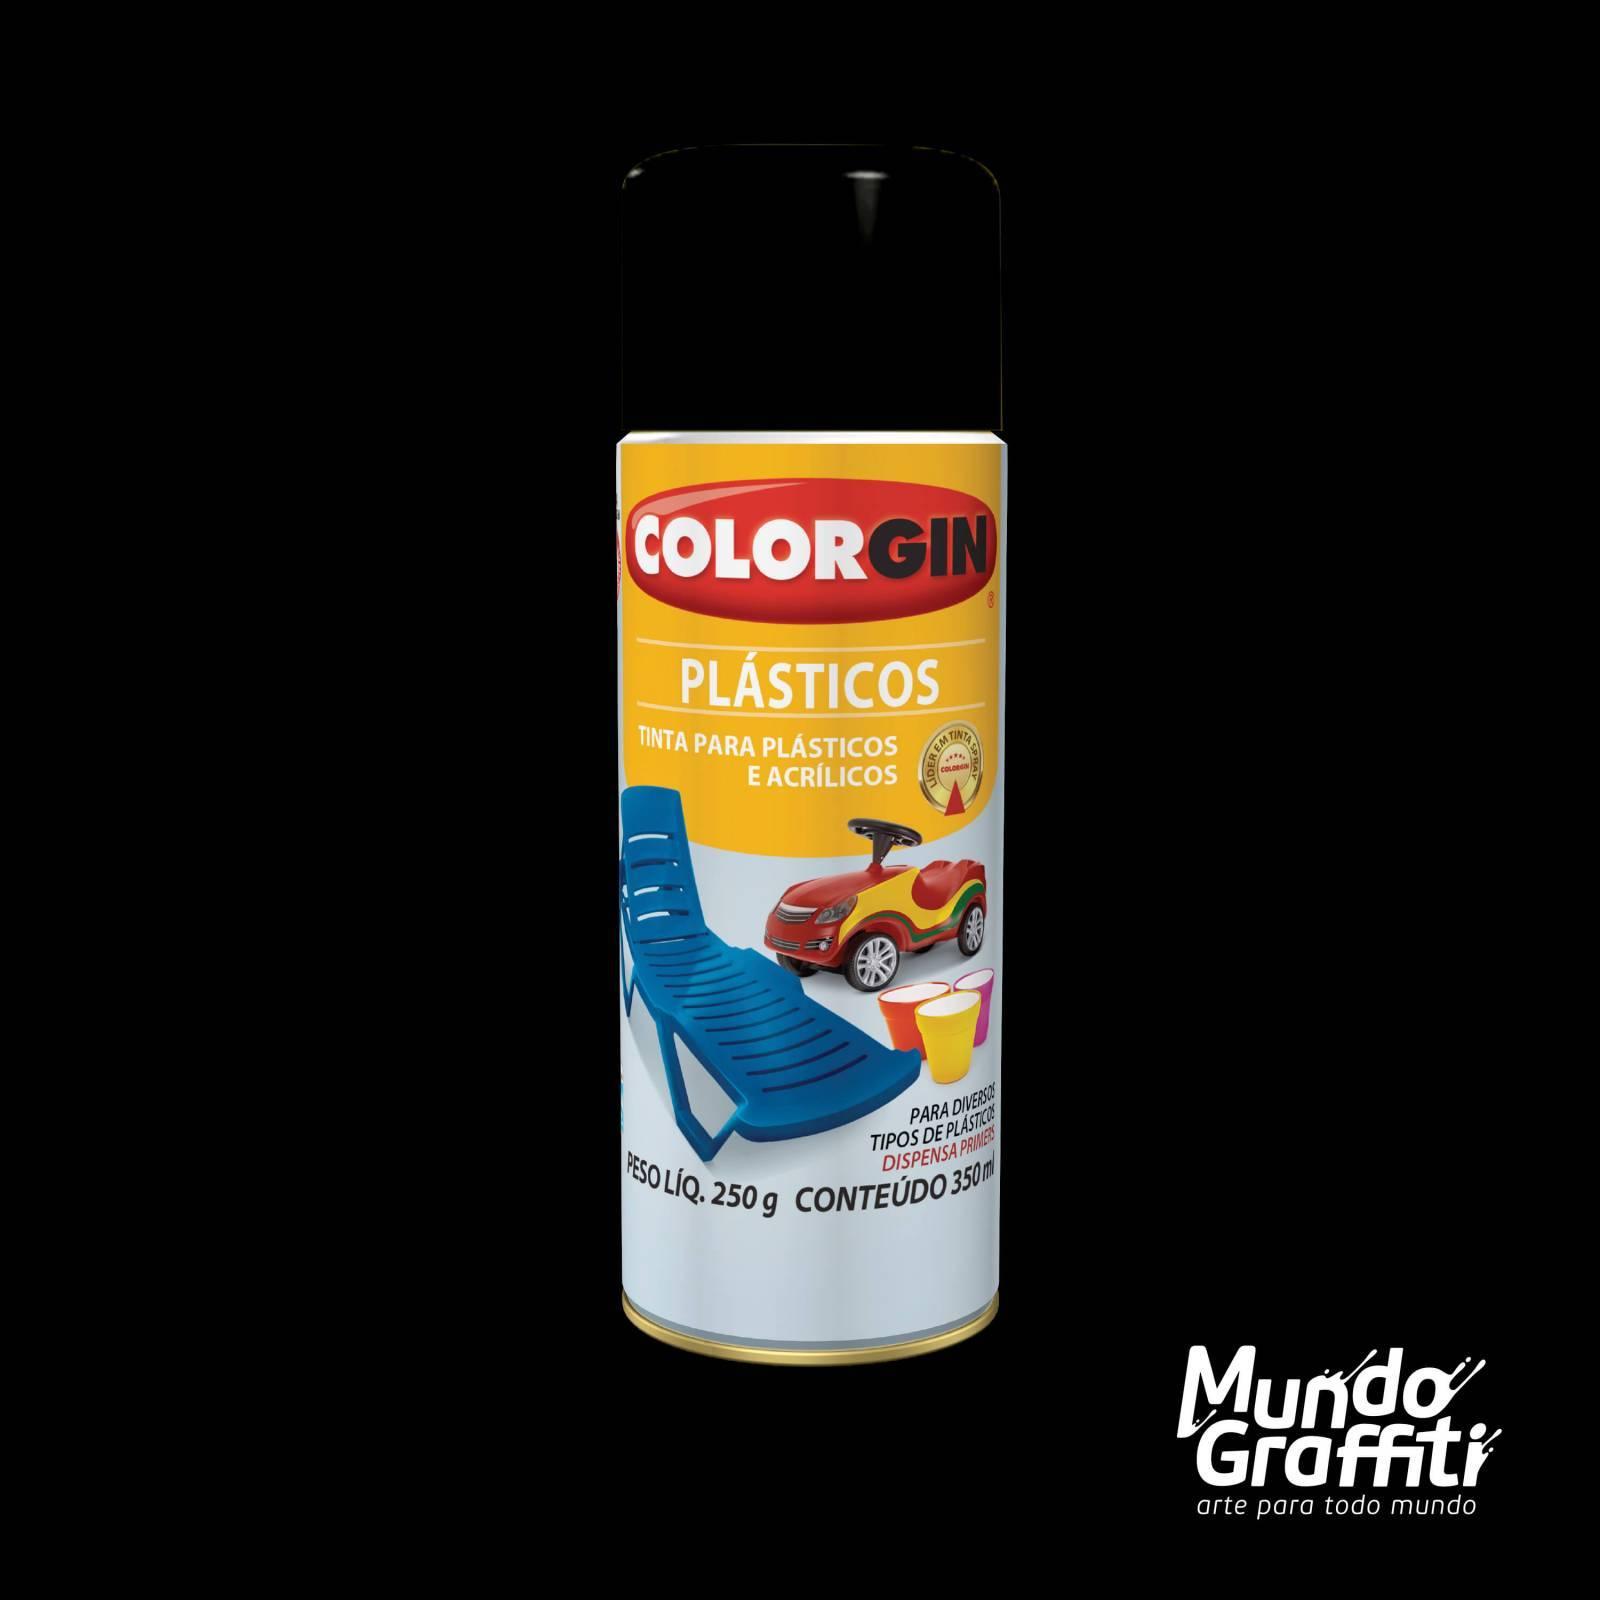 Tinta Spray Colorgin p/ Plasticos 1511 Preto Fosco 350ml - Mundo Graffiti